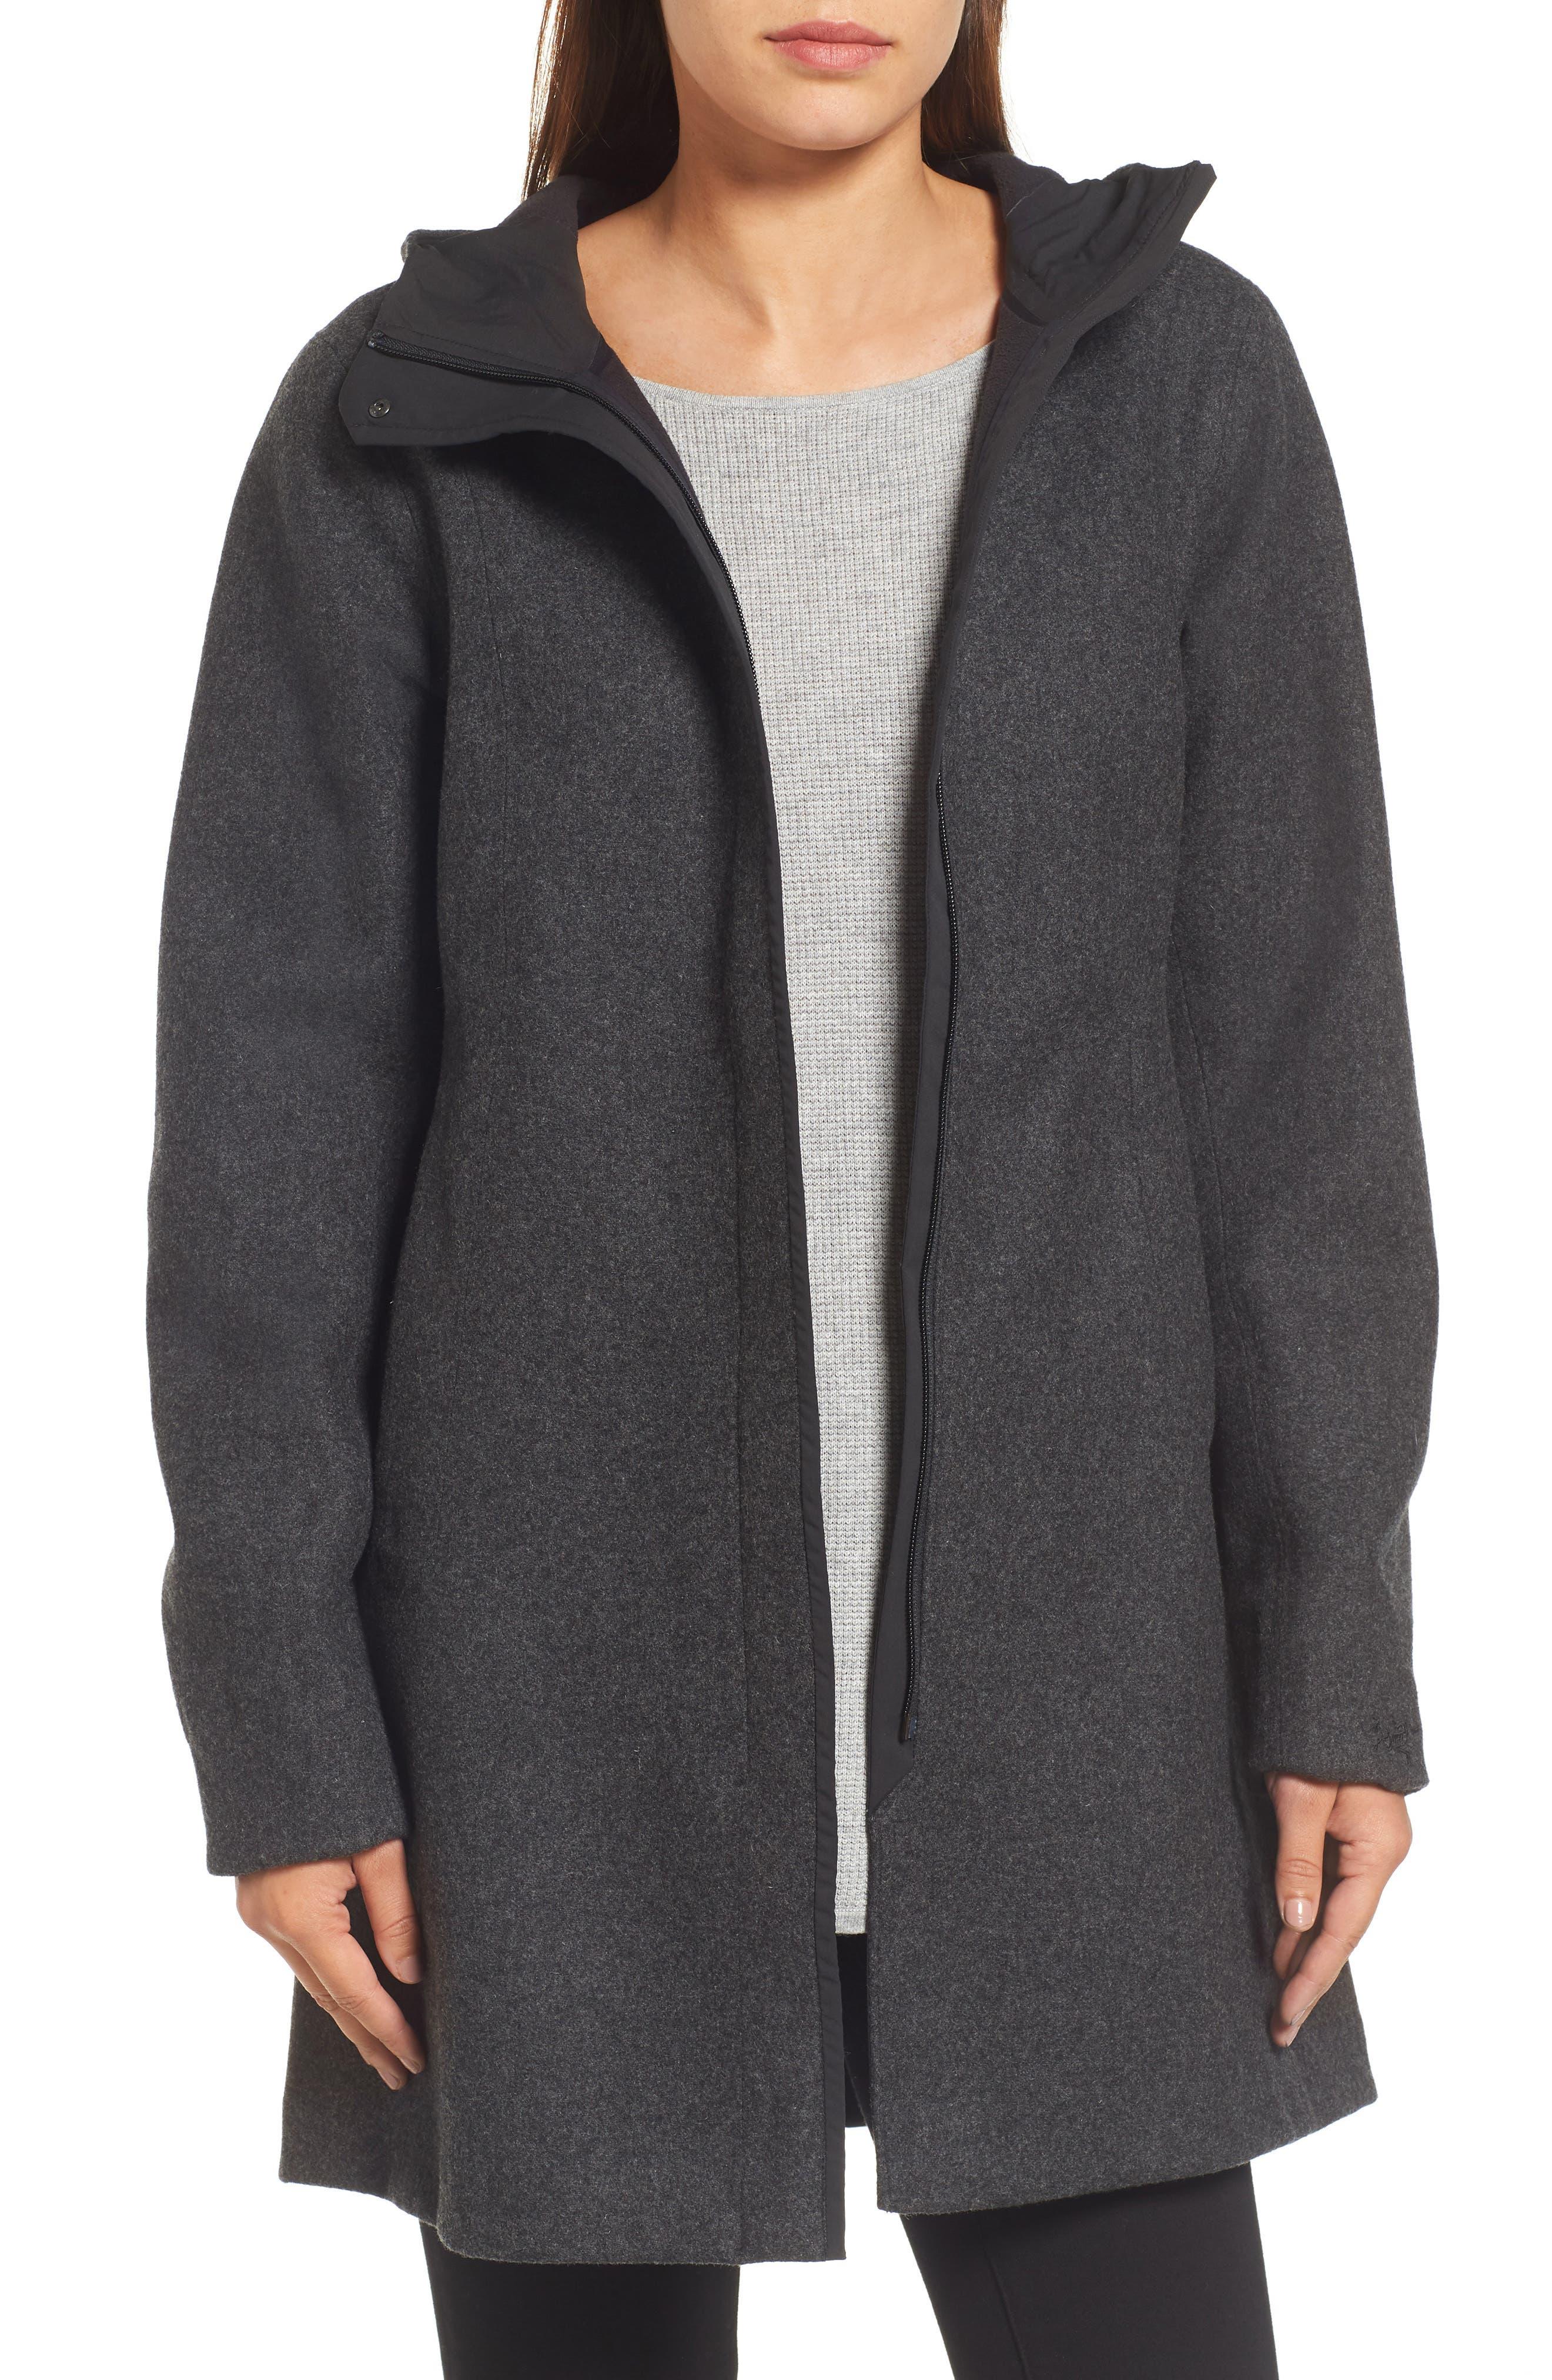 Embra Hooded Walking Coat,                         Main,                         color, 001